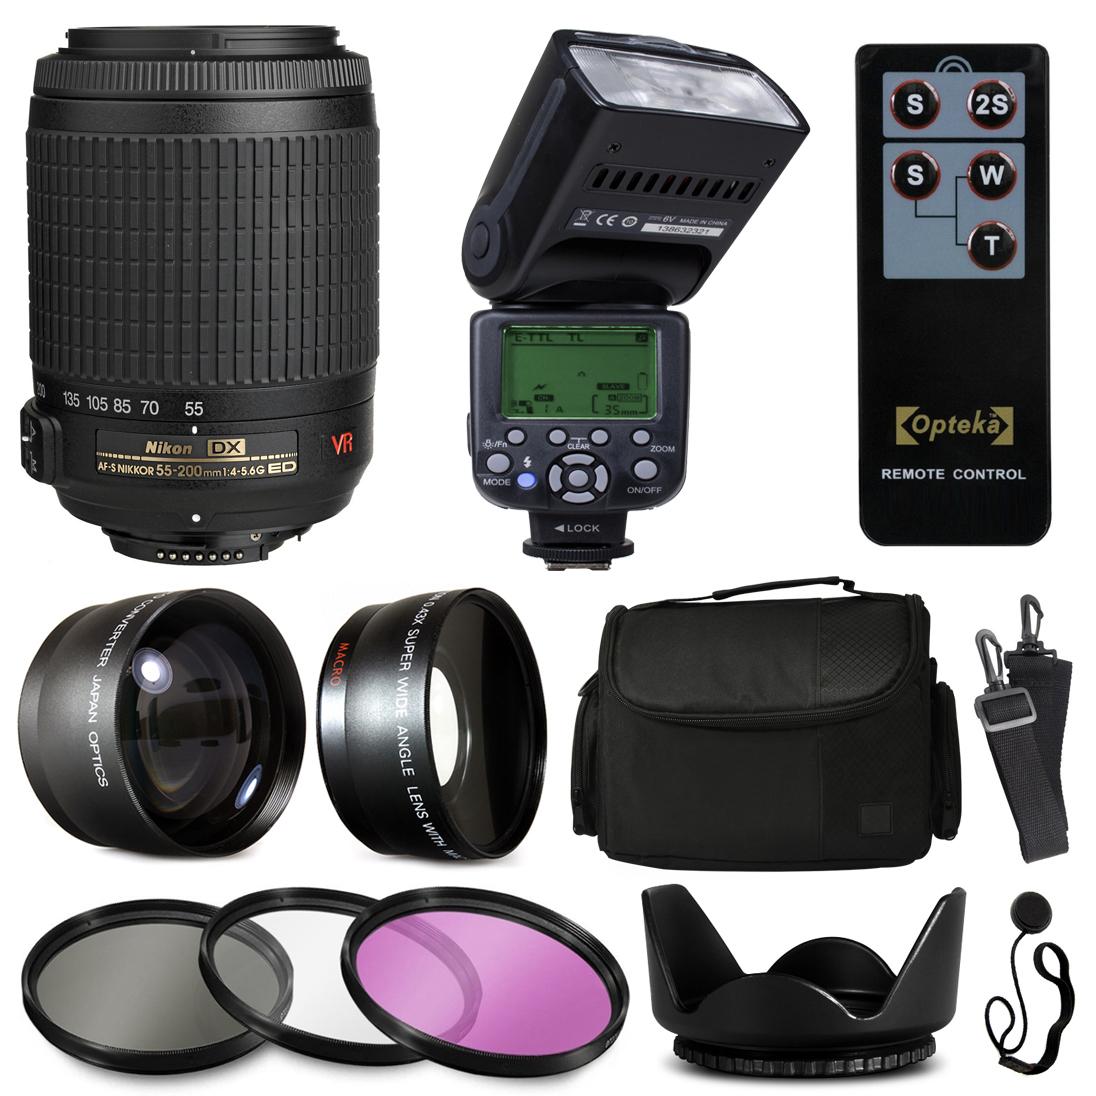 Nikon VR 55-200mm Lens 2166 + Accessories Bundle with 2.2...